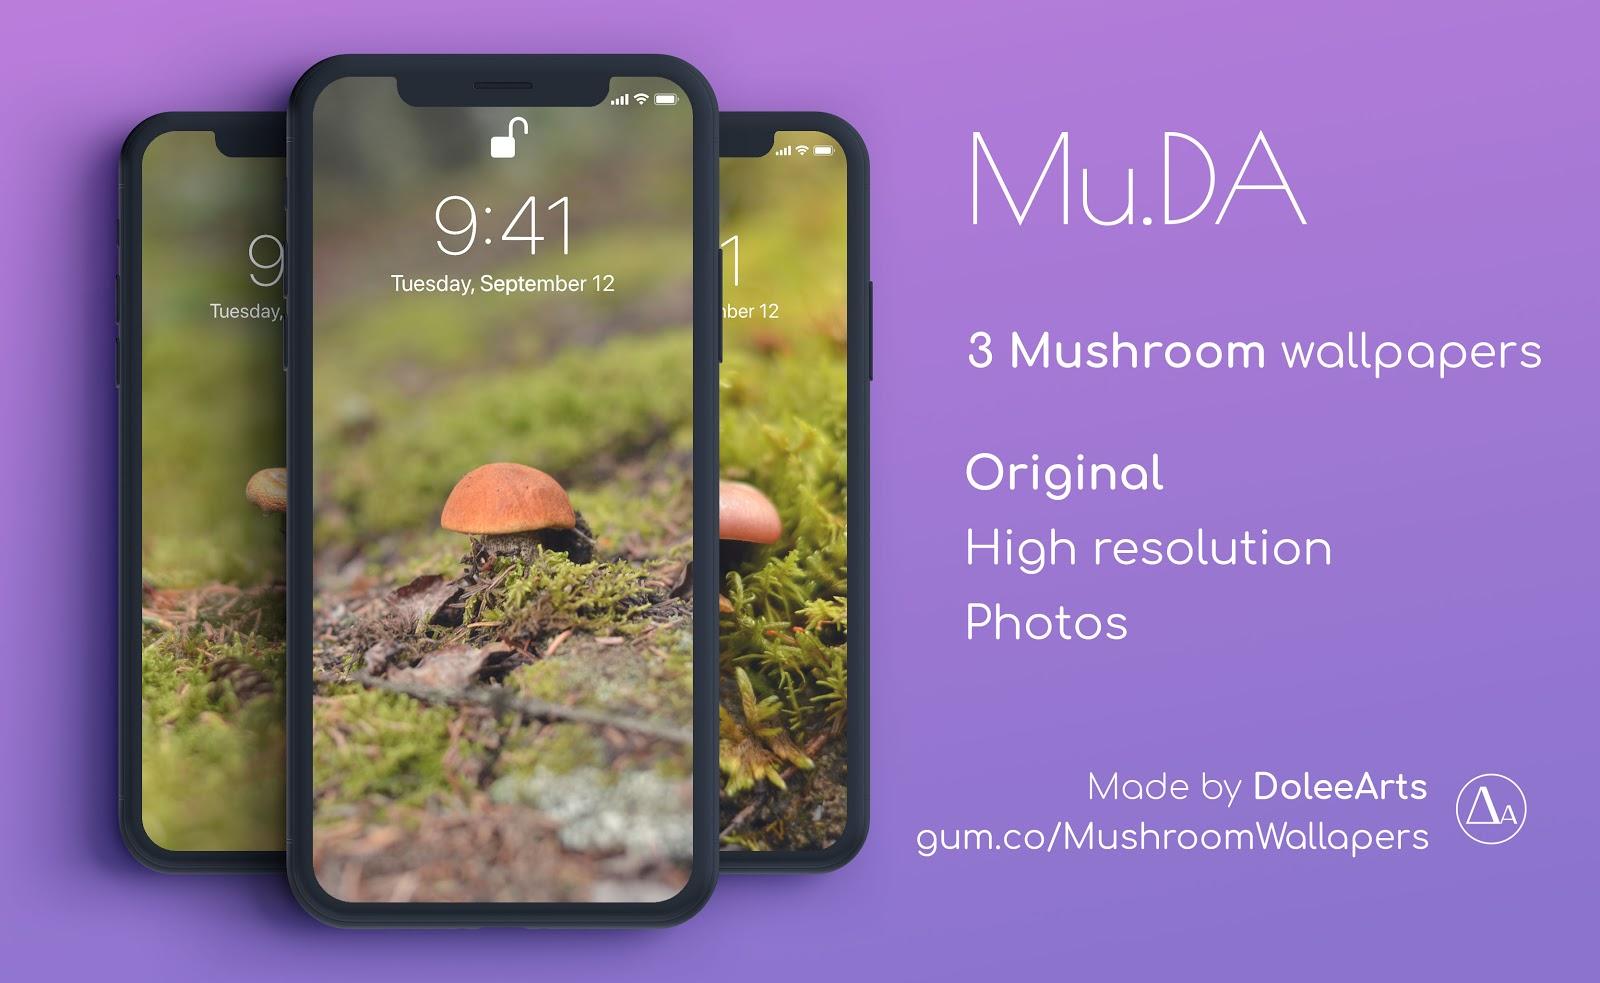 Mu.DA: Mushroom Wallpapers